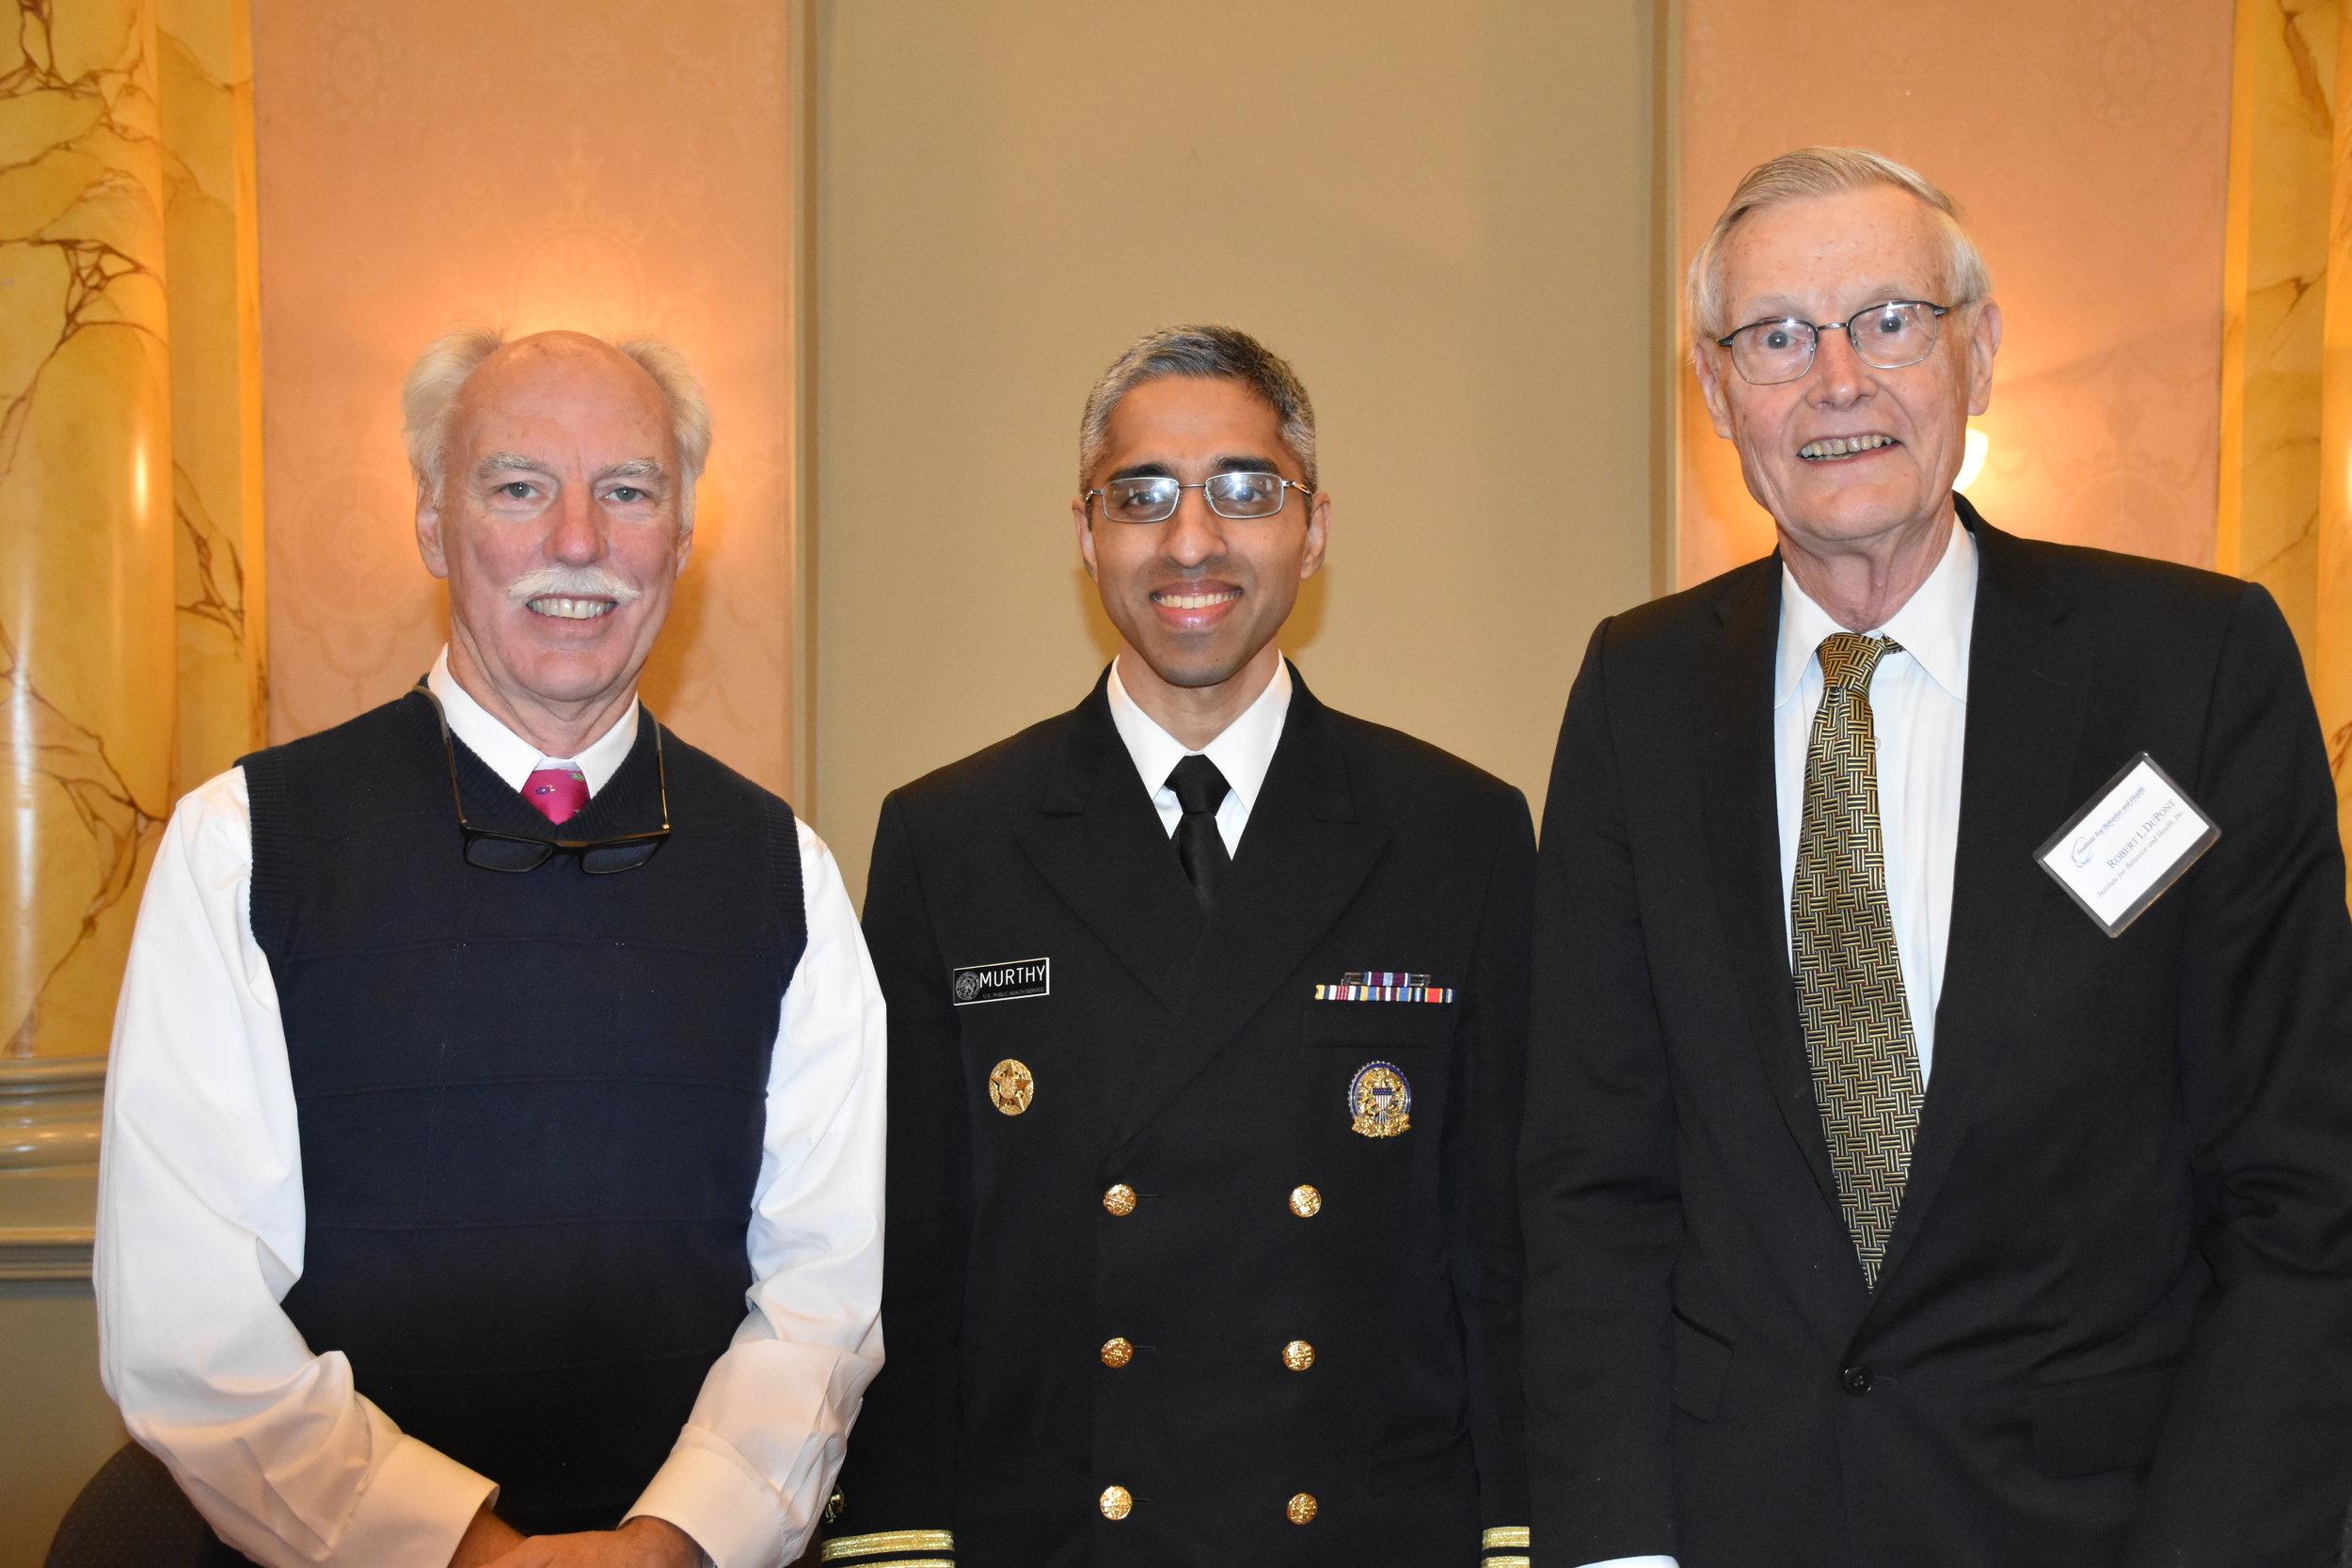 Drs. McLellan, Murthy and DuPont